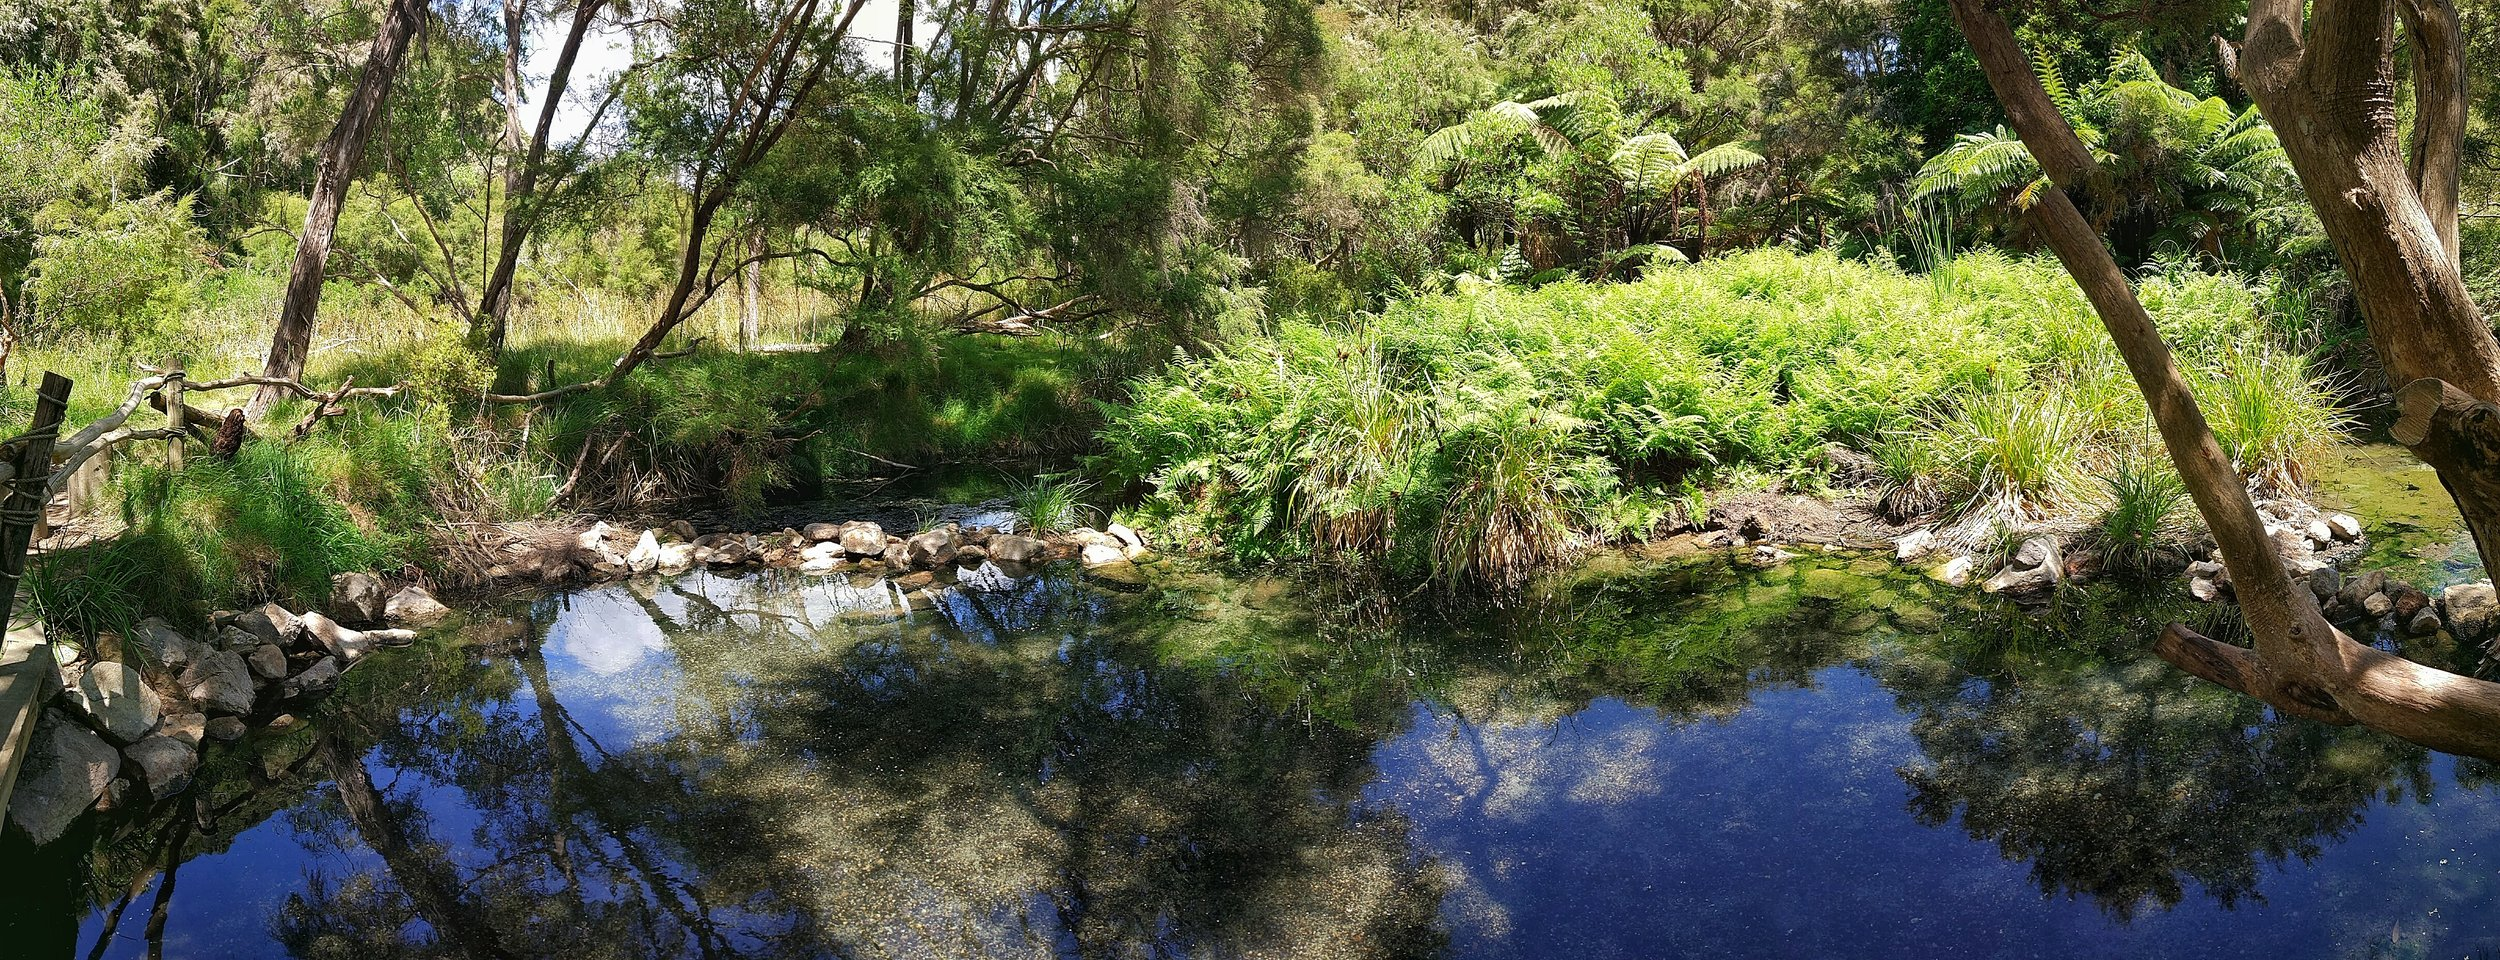 Hot Spring on the Tarawera Trail